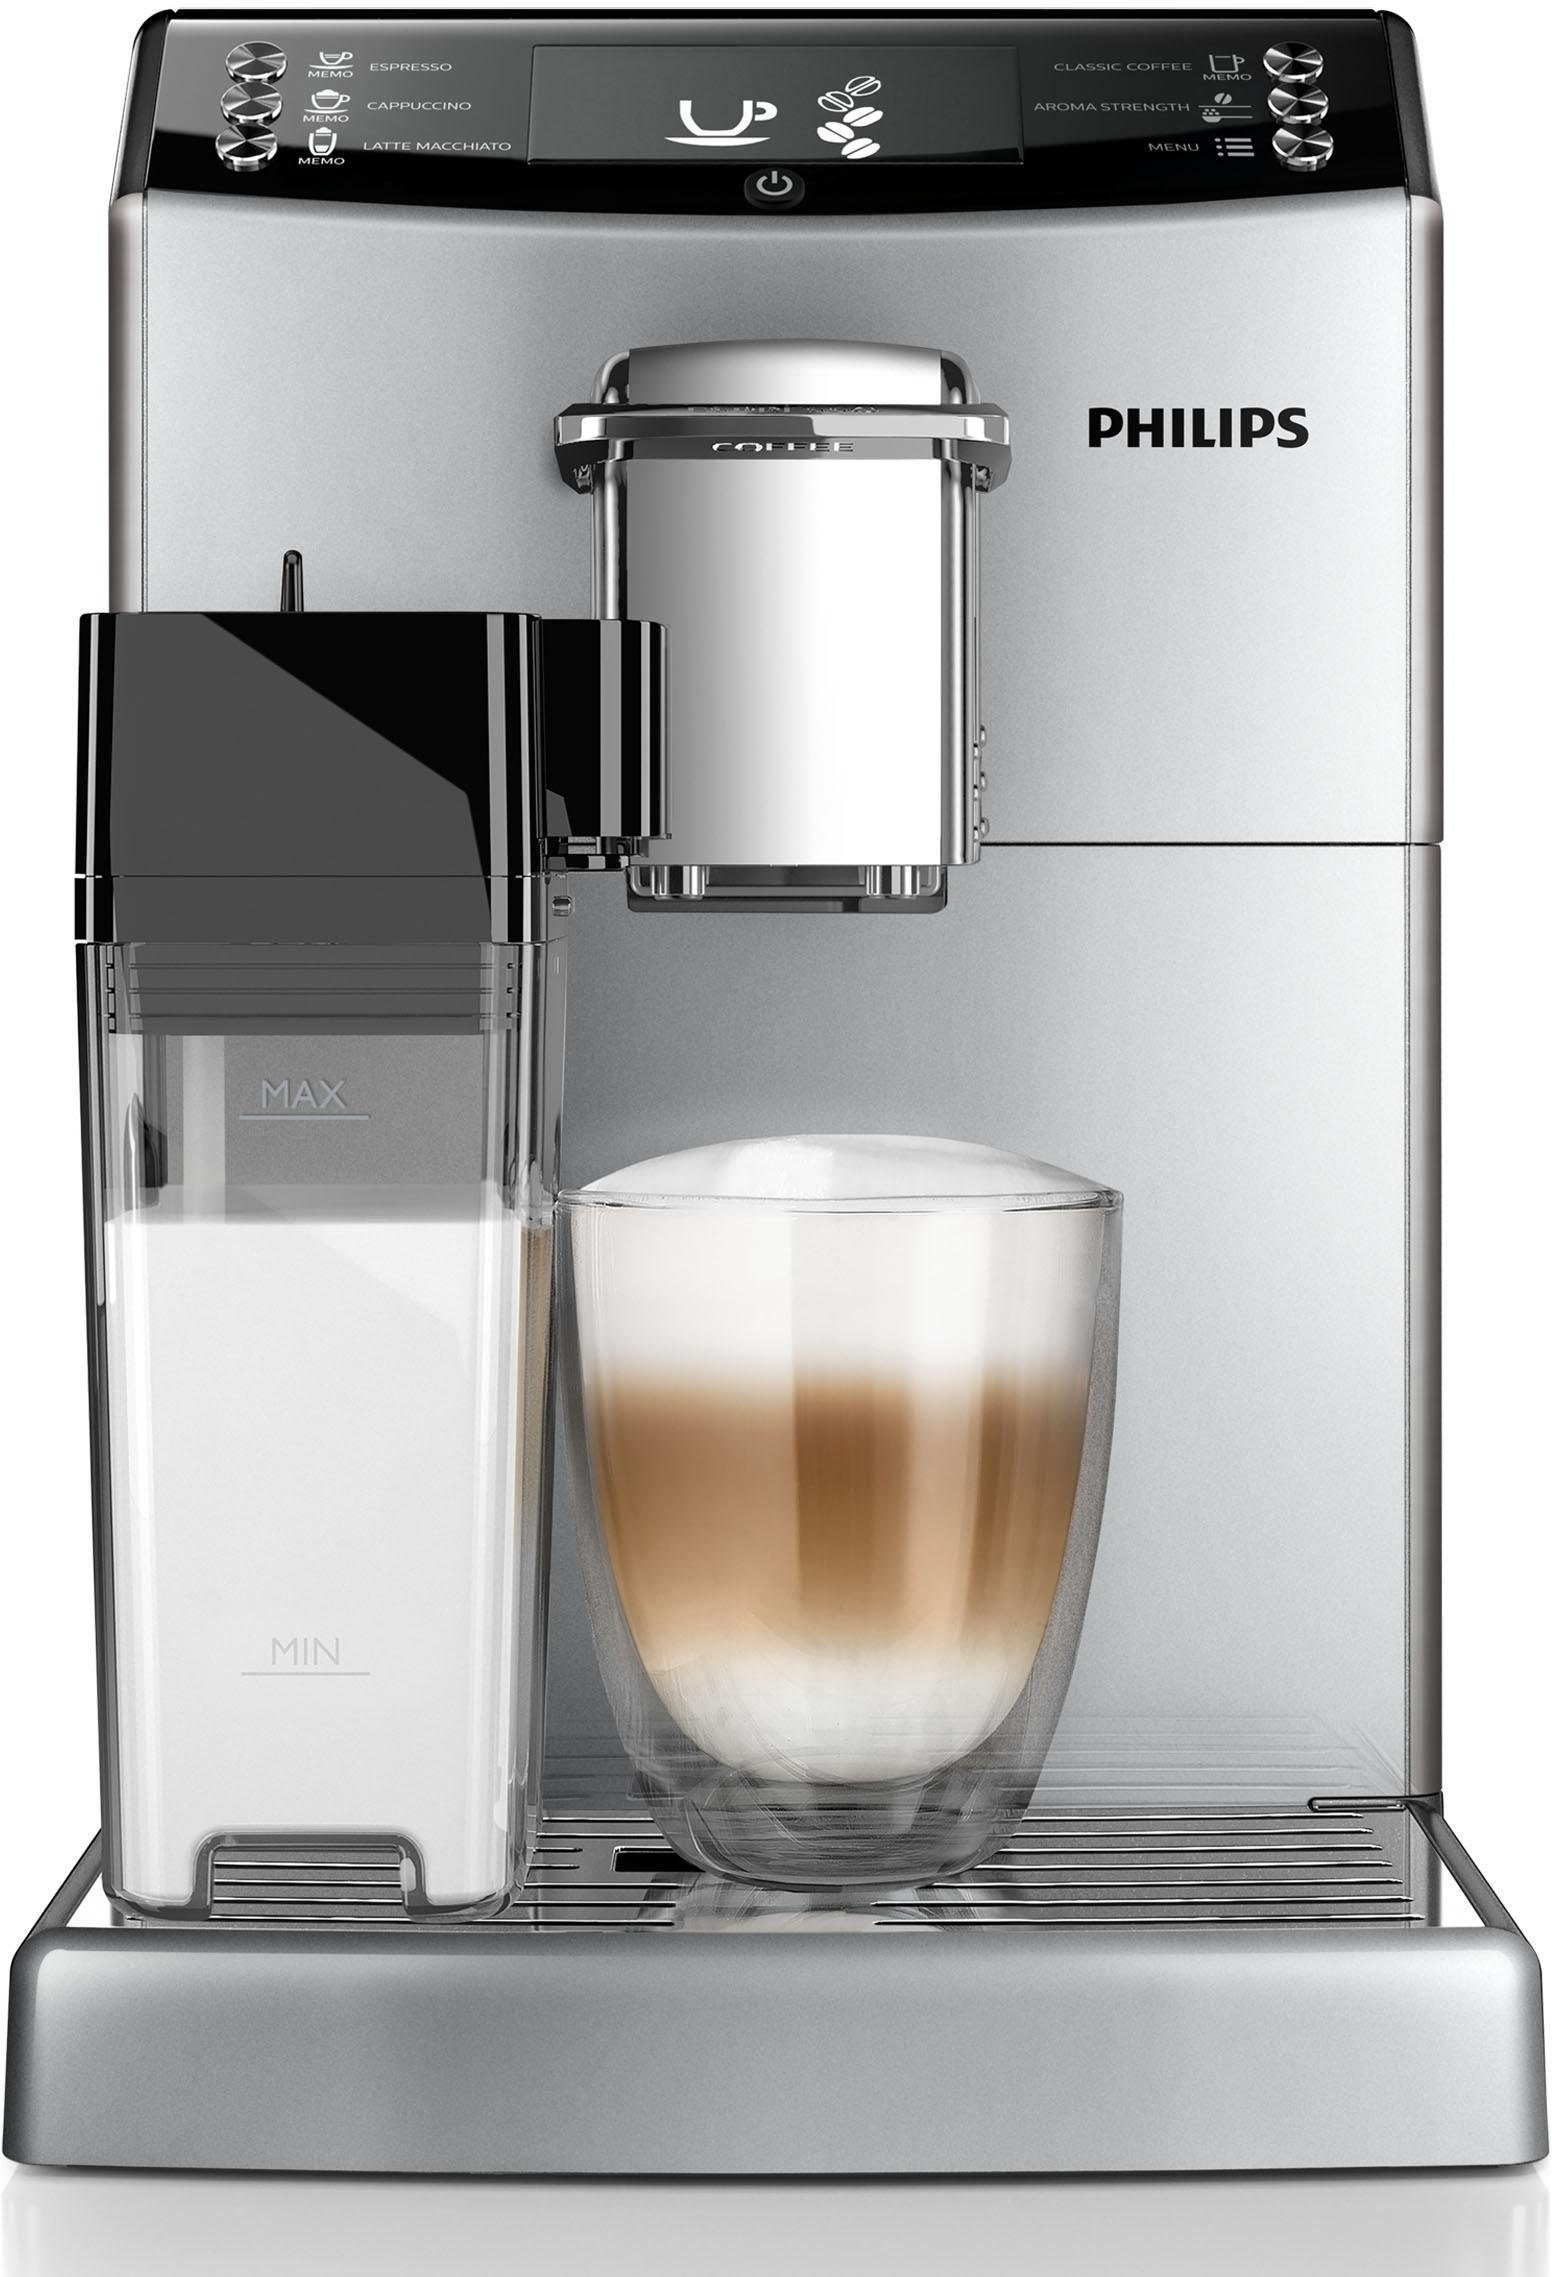 Philips Kaffeevollautomat 4000 Serie EP4050/10, mit Milchkaraffe